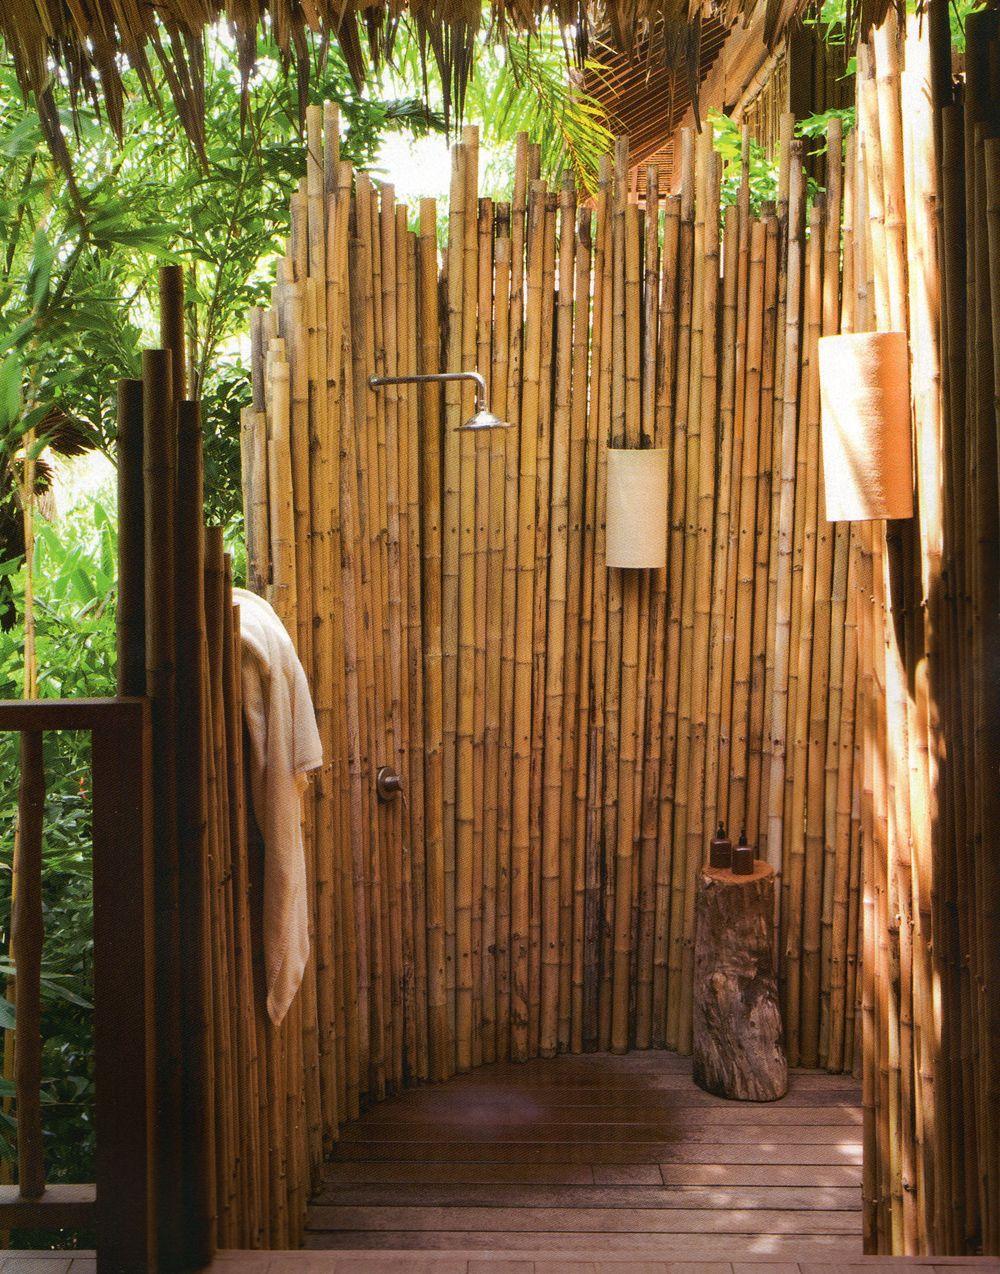 Bamboo Outdoor Shower | Exteriors | Pinterest | Bamboo screening ...